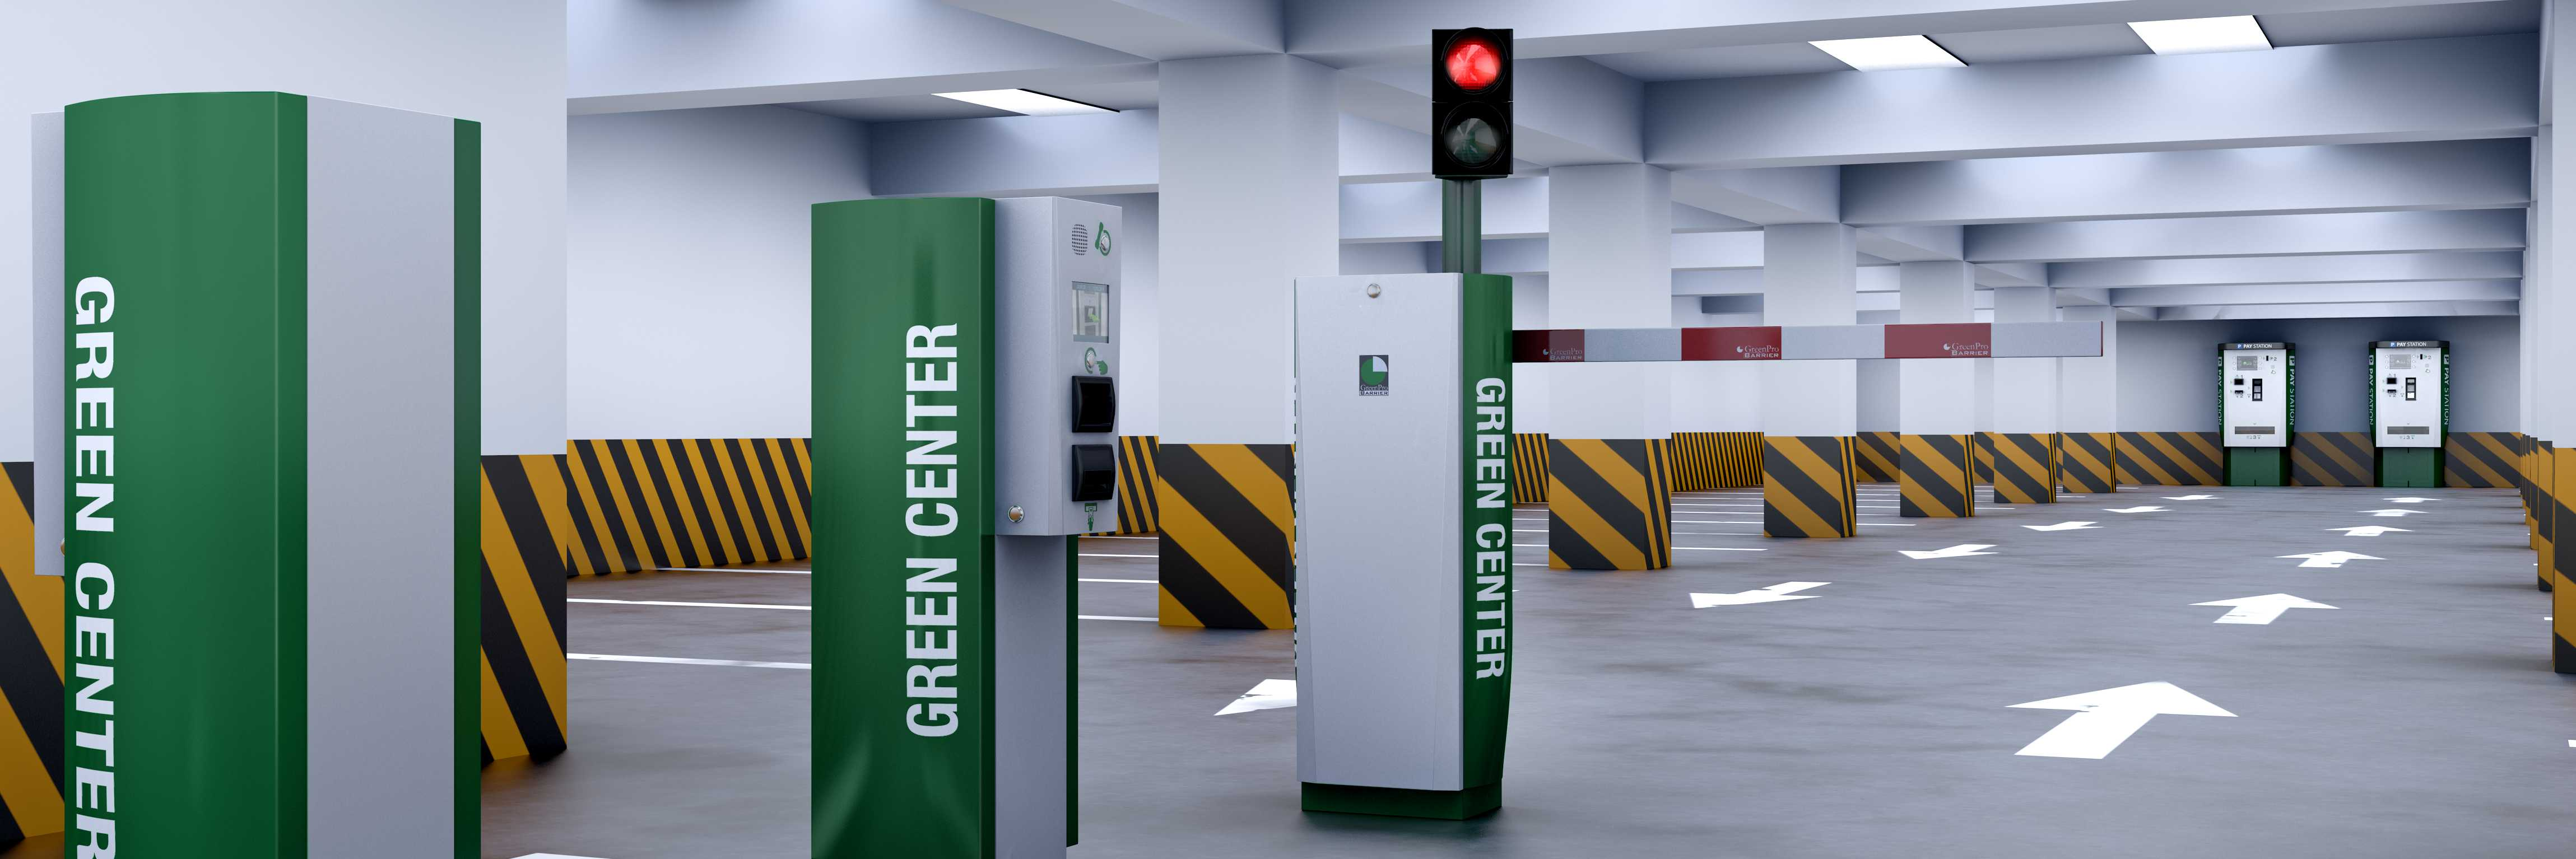 pjpg-parking-guidance-system-5.jpg